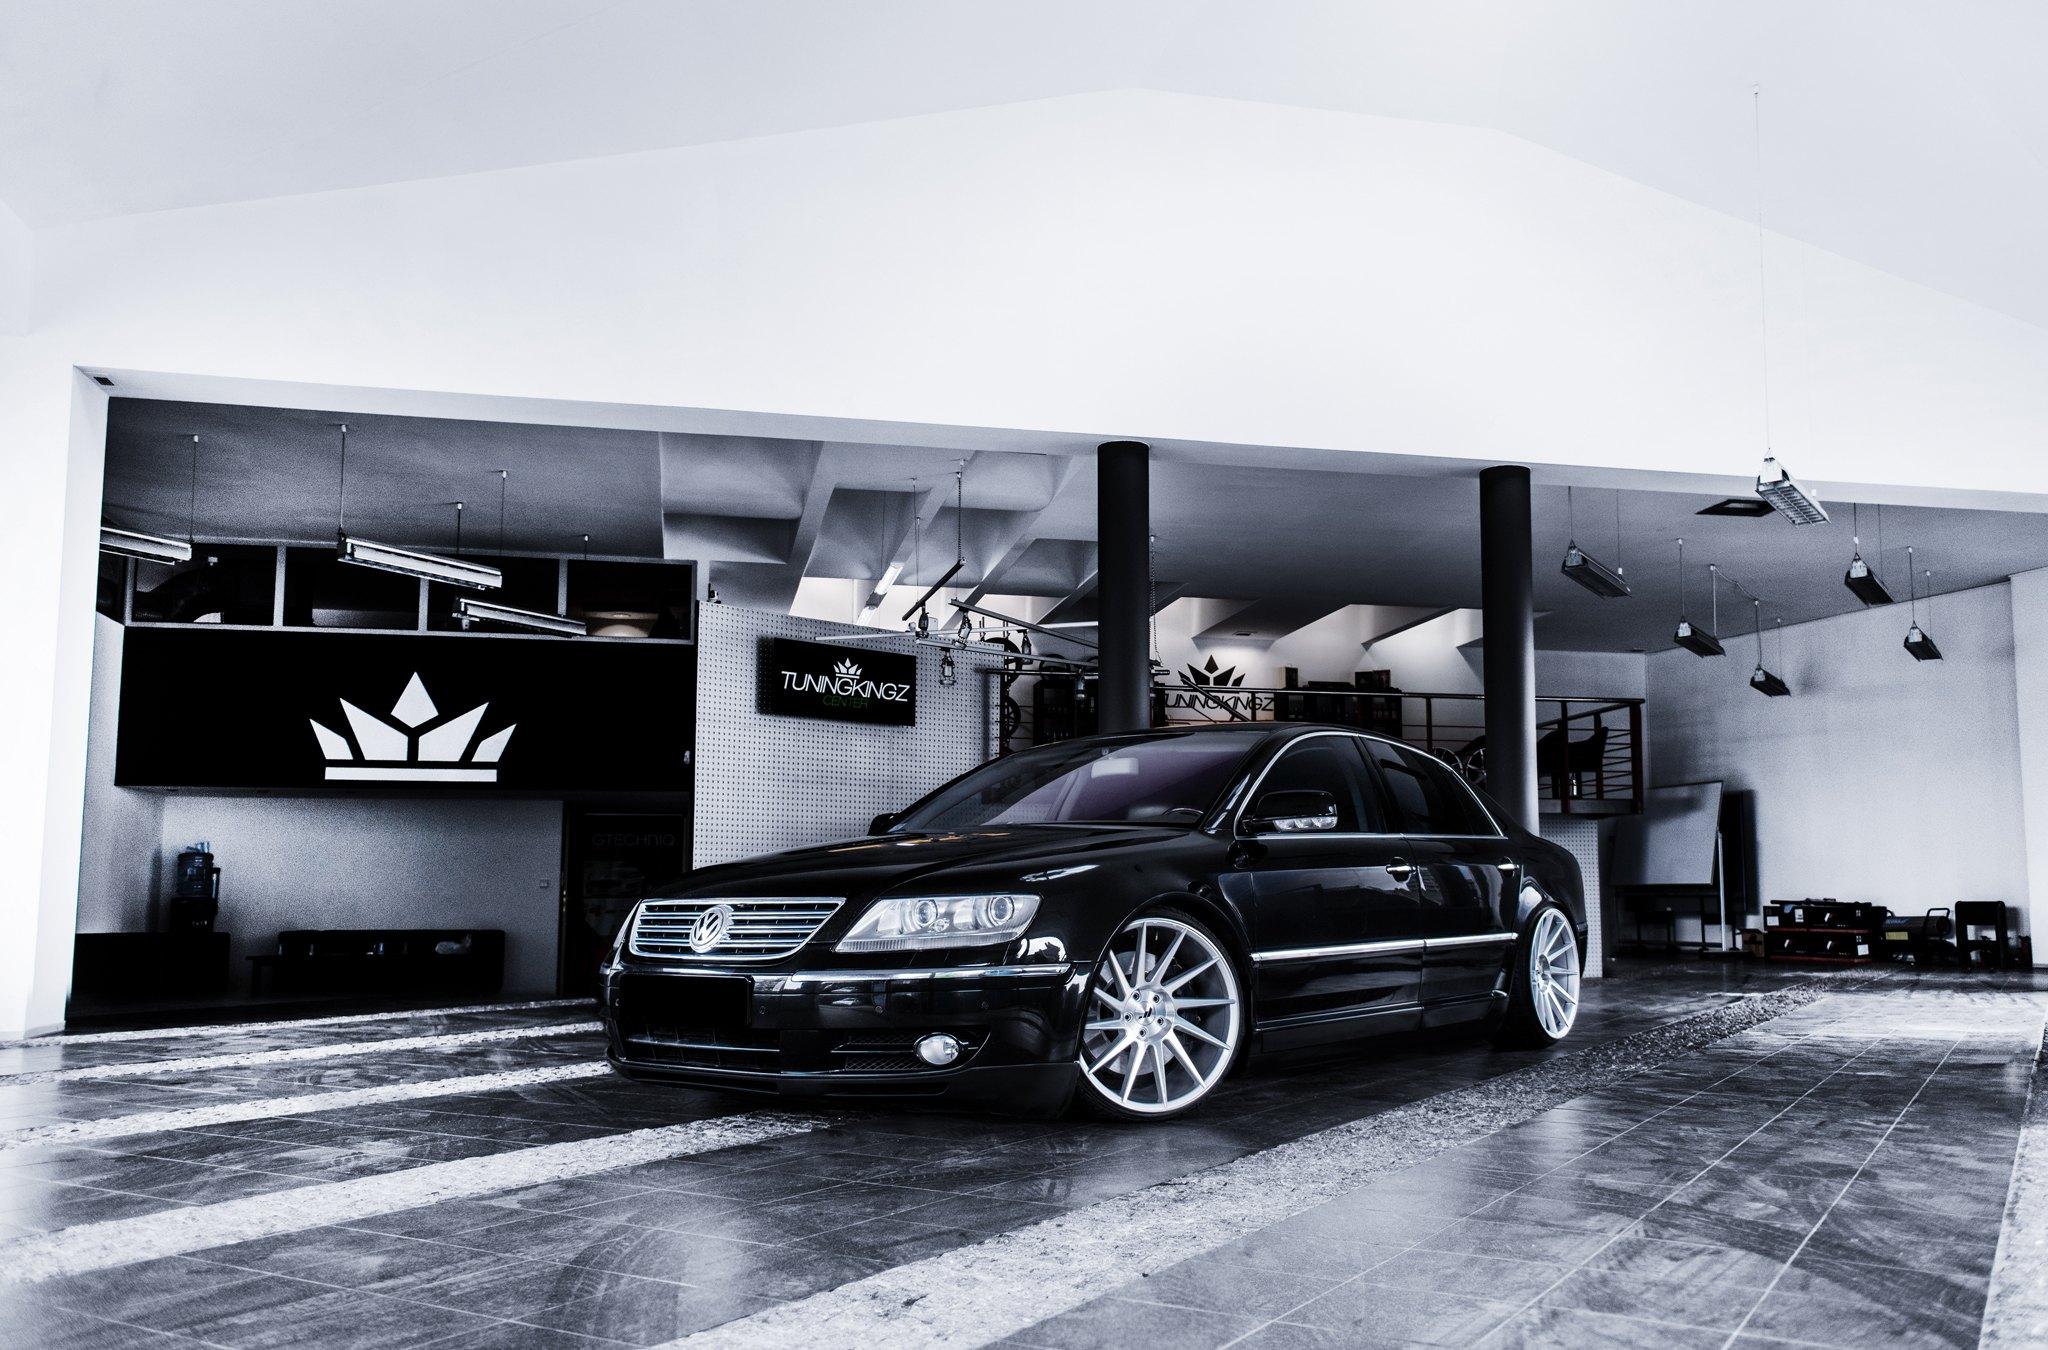 "VWVortex.com - FS: VW Phaeton 18"" Rims & tires |Volkswagen Phaeton Wheels"